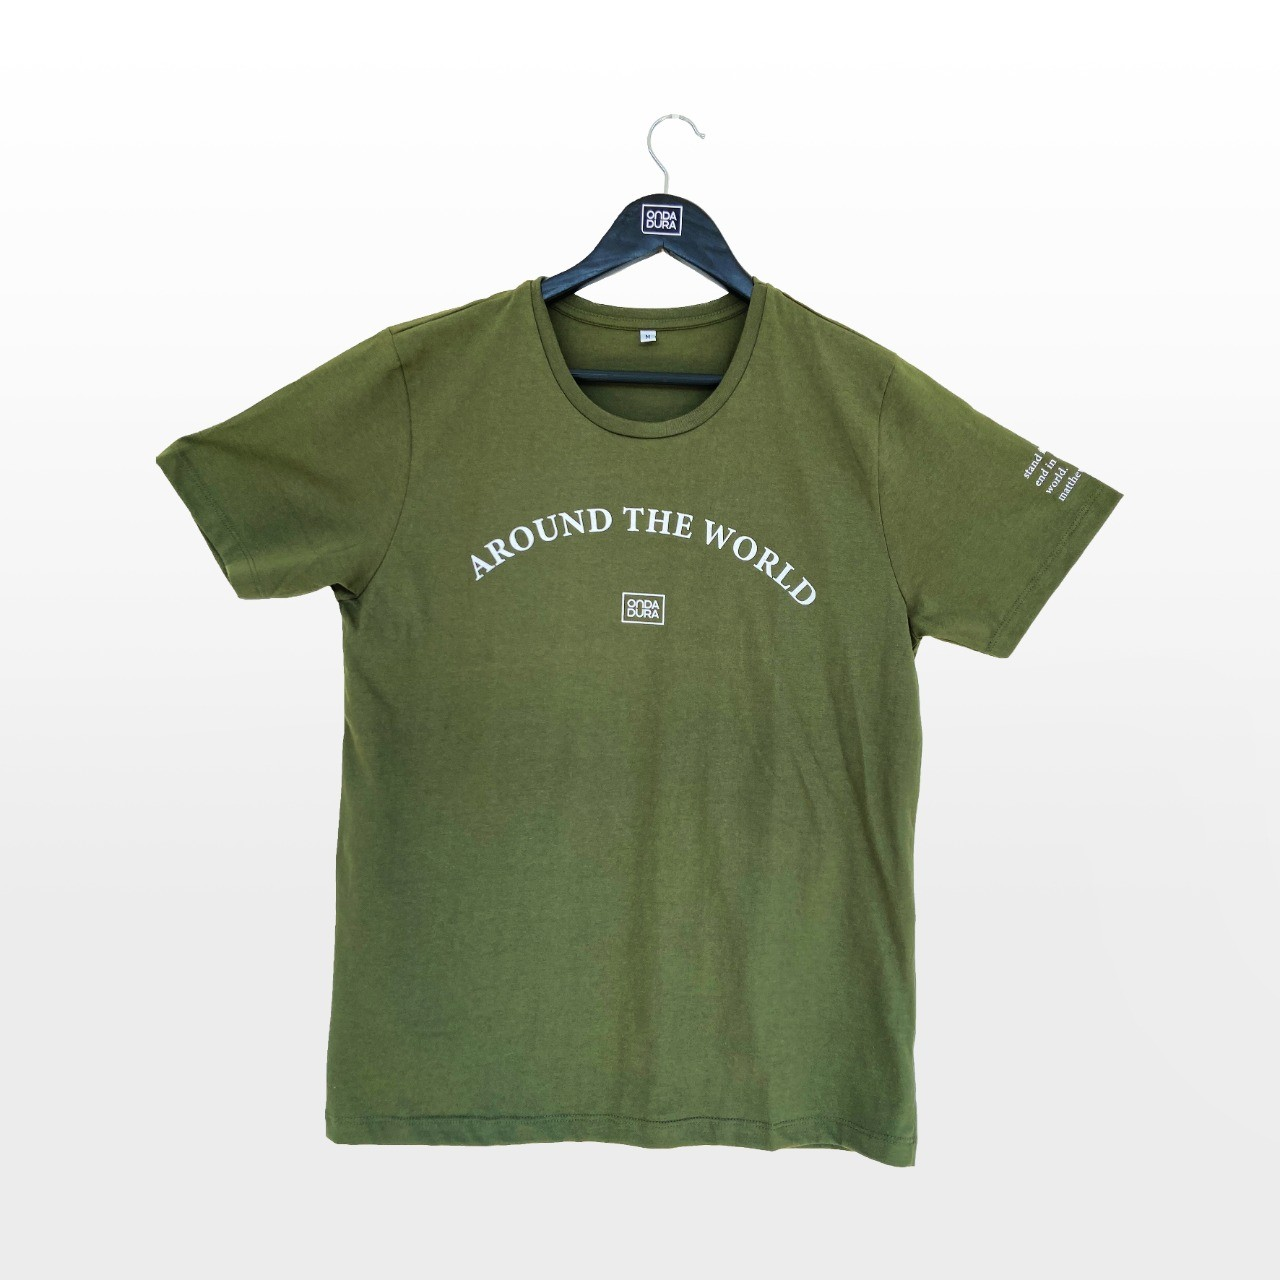 Camiseta verde World Wide